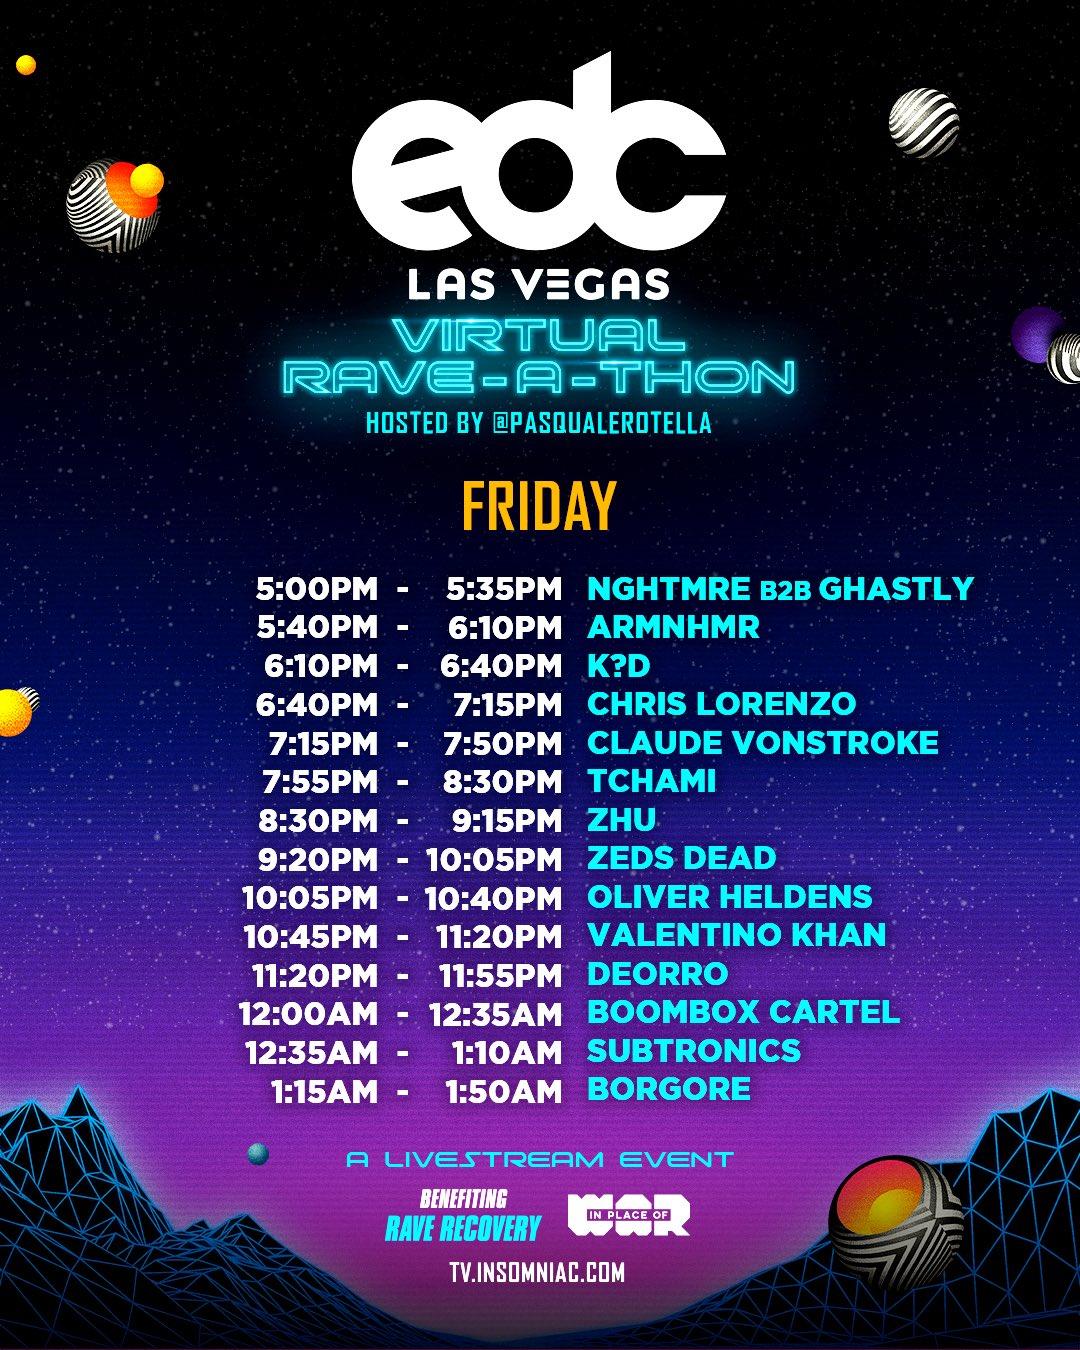 EDC Las Vegas Virtual Rave-A-Thon Schedule - Friday